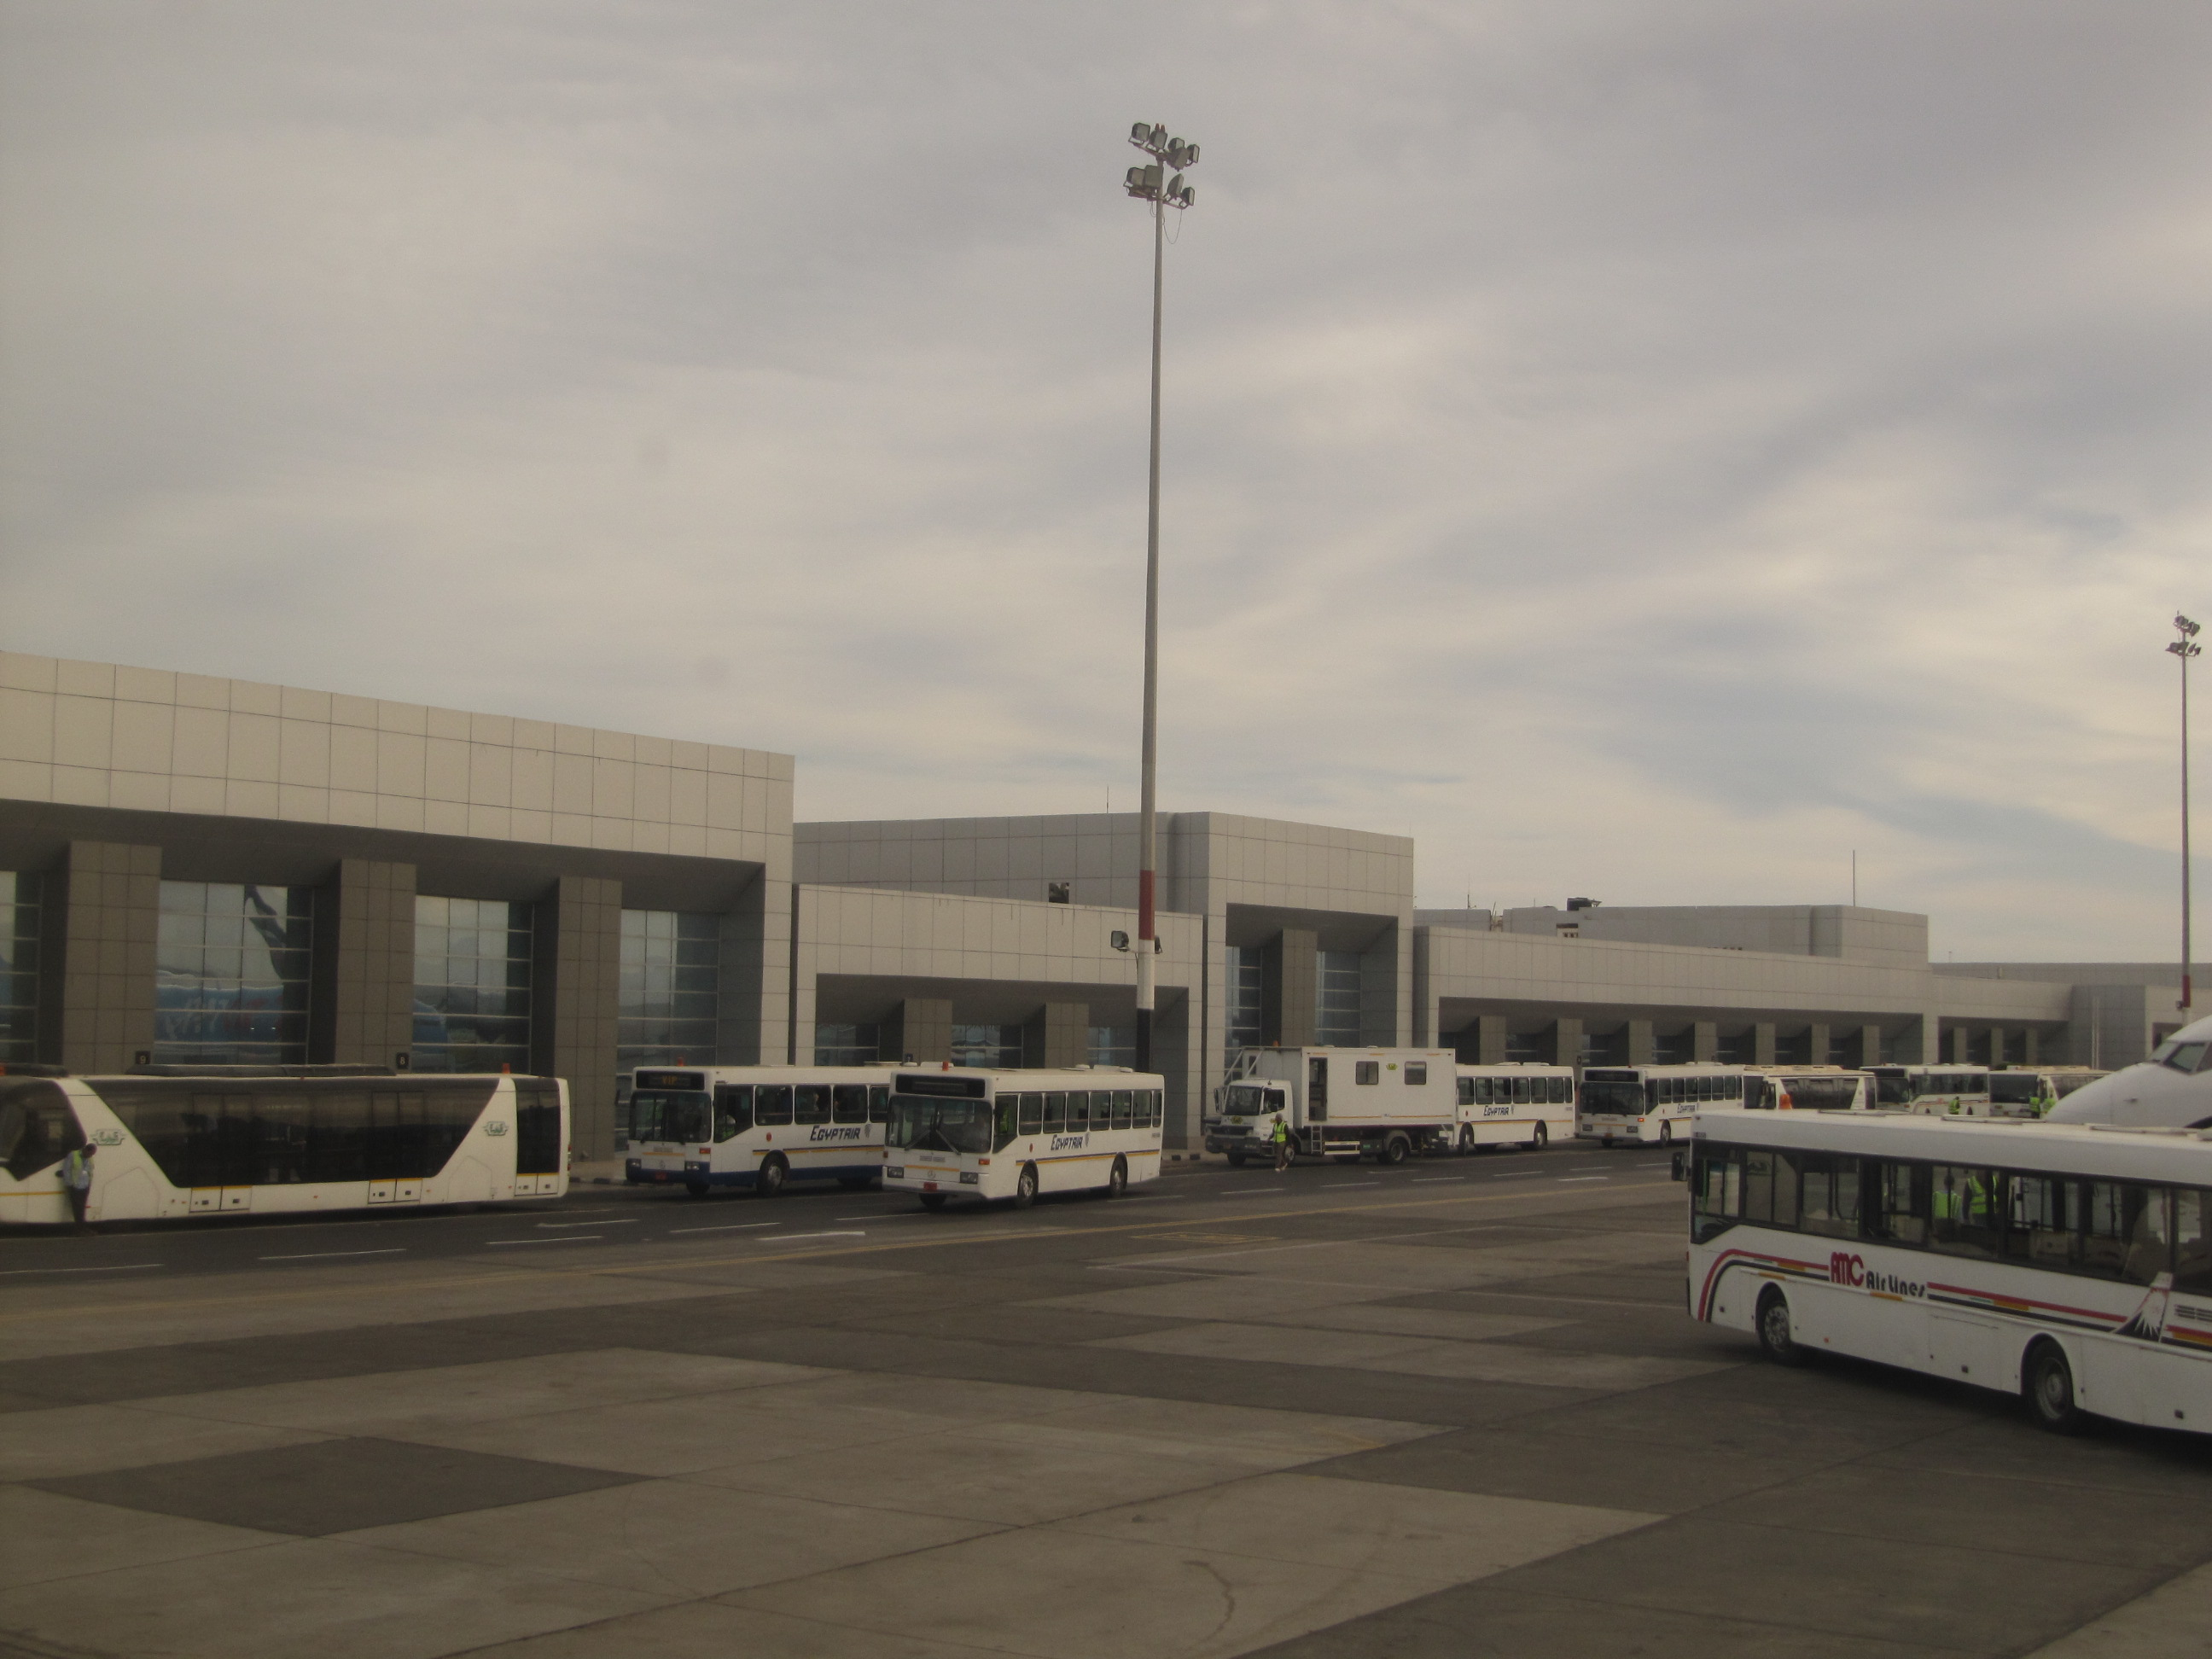 Hurghada Airport (Hurghada International Airport).